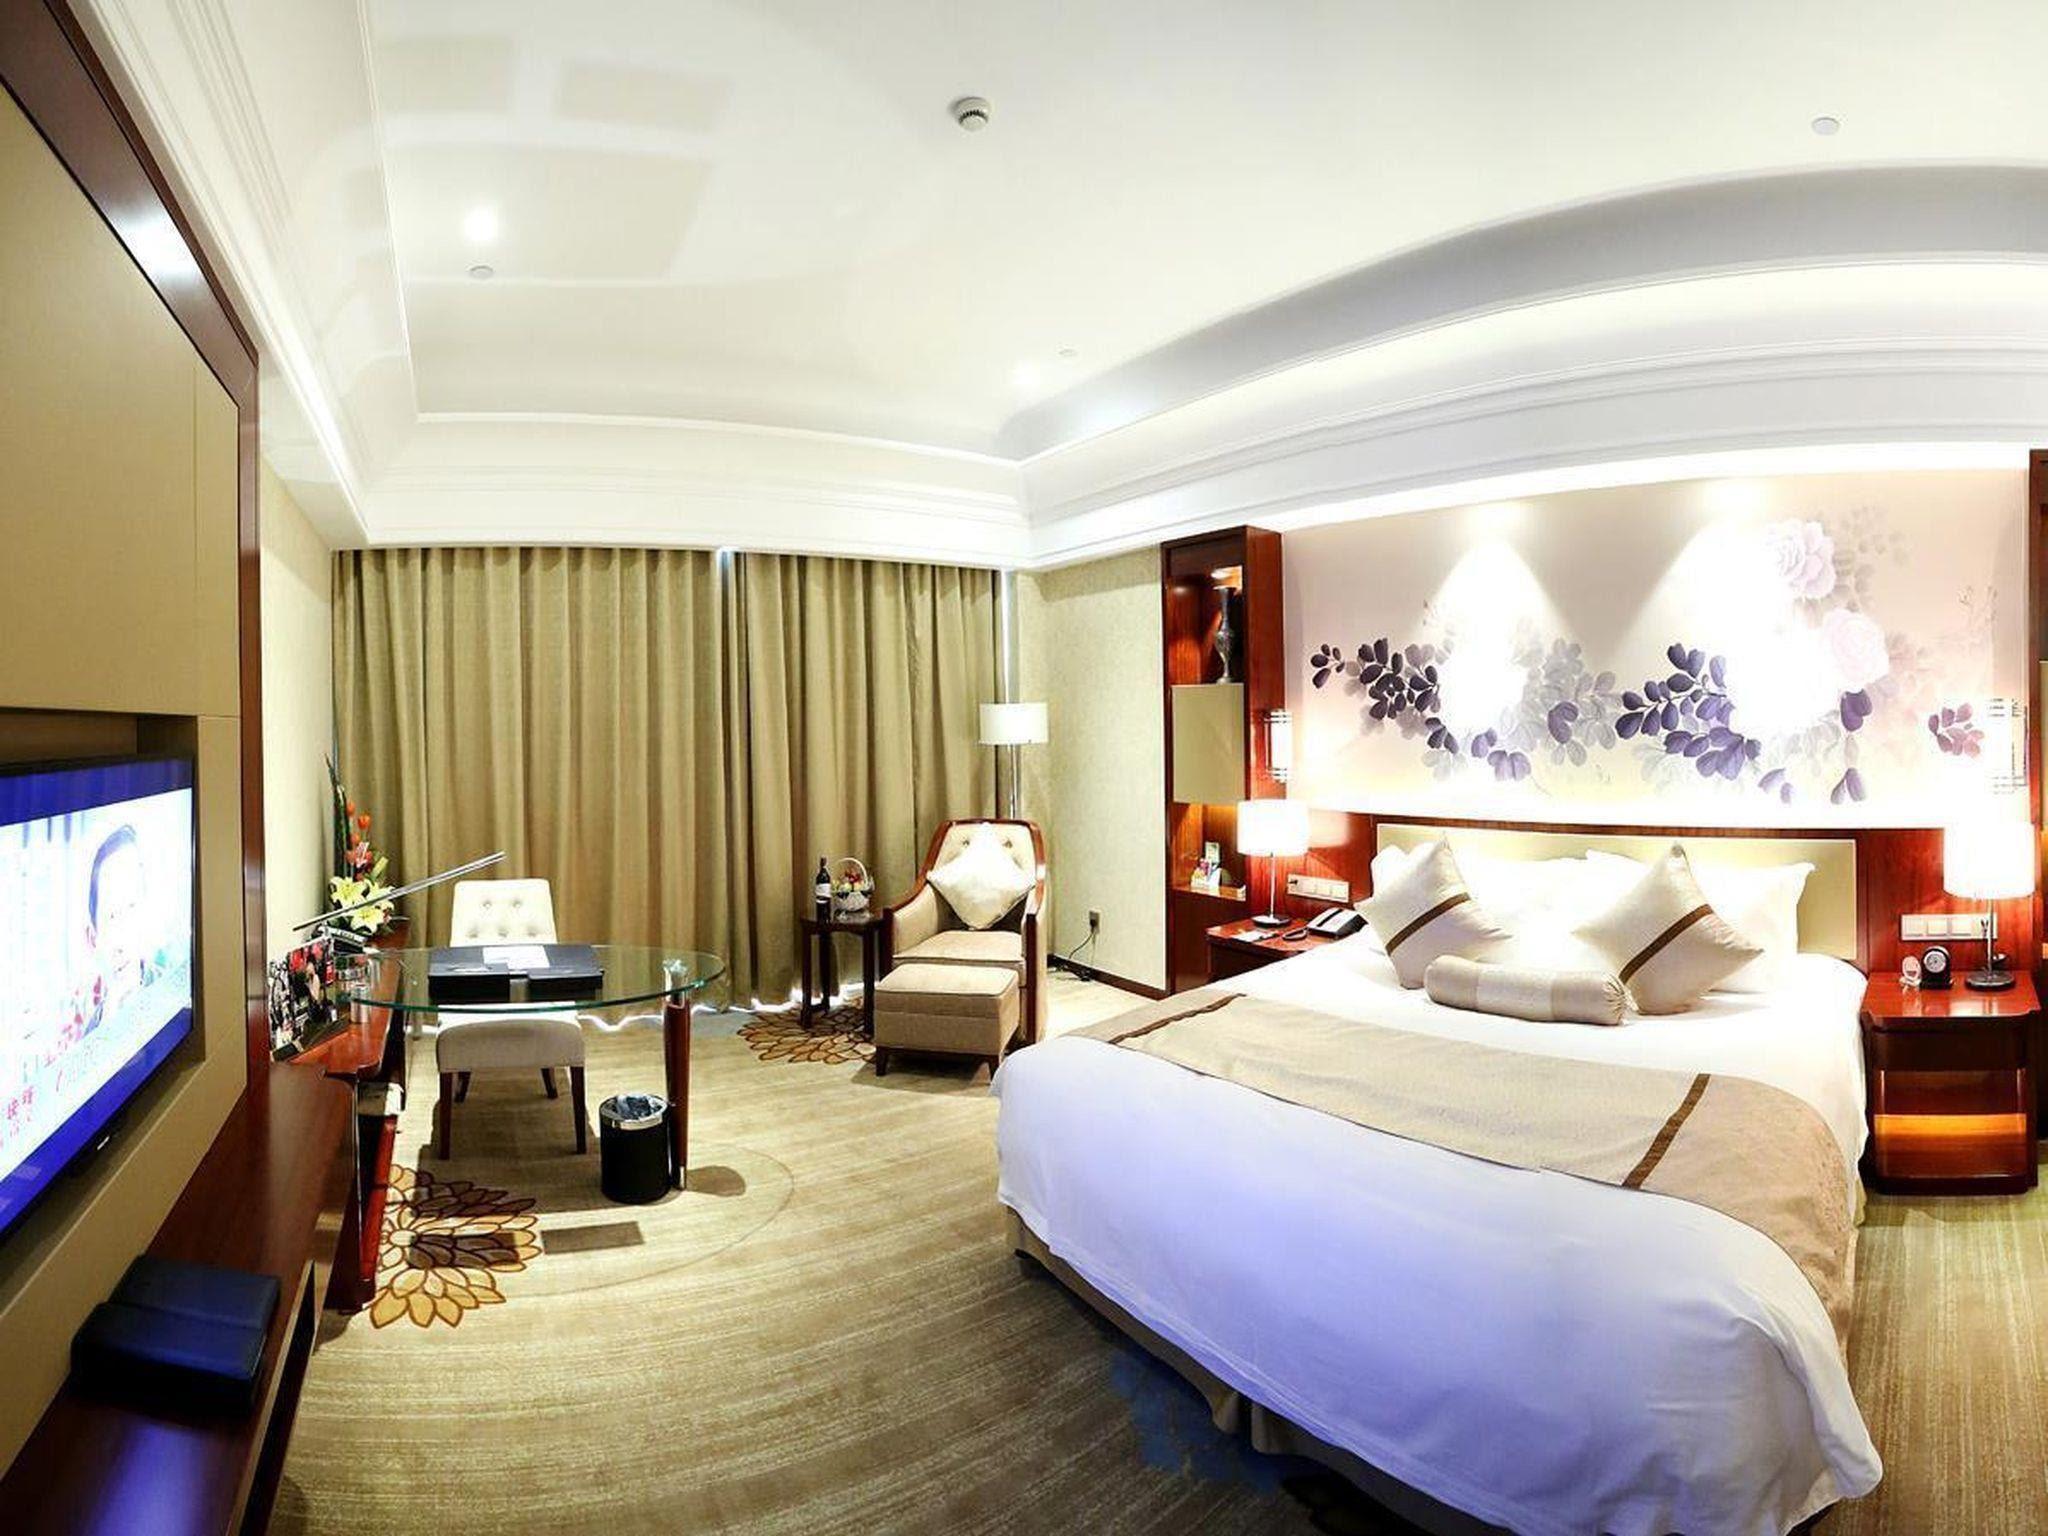 Price America's Best Rixin International Hotel